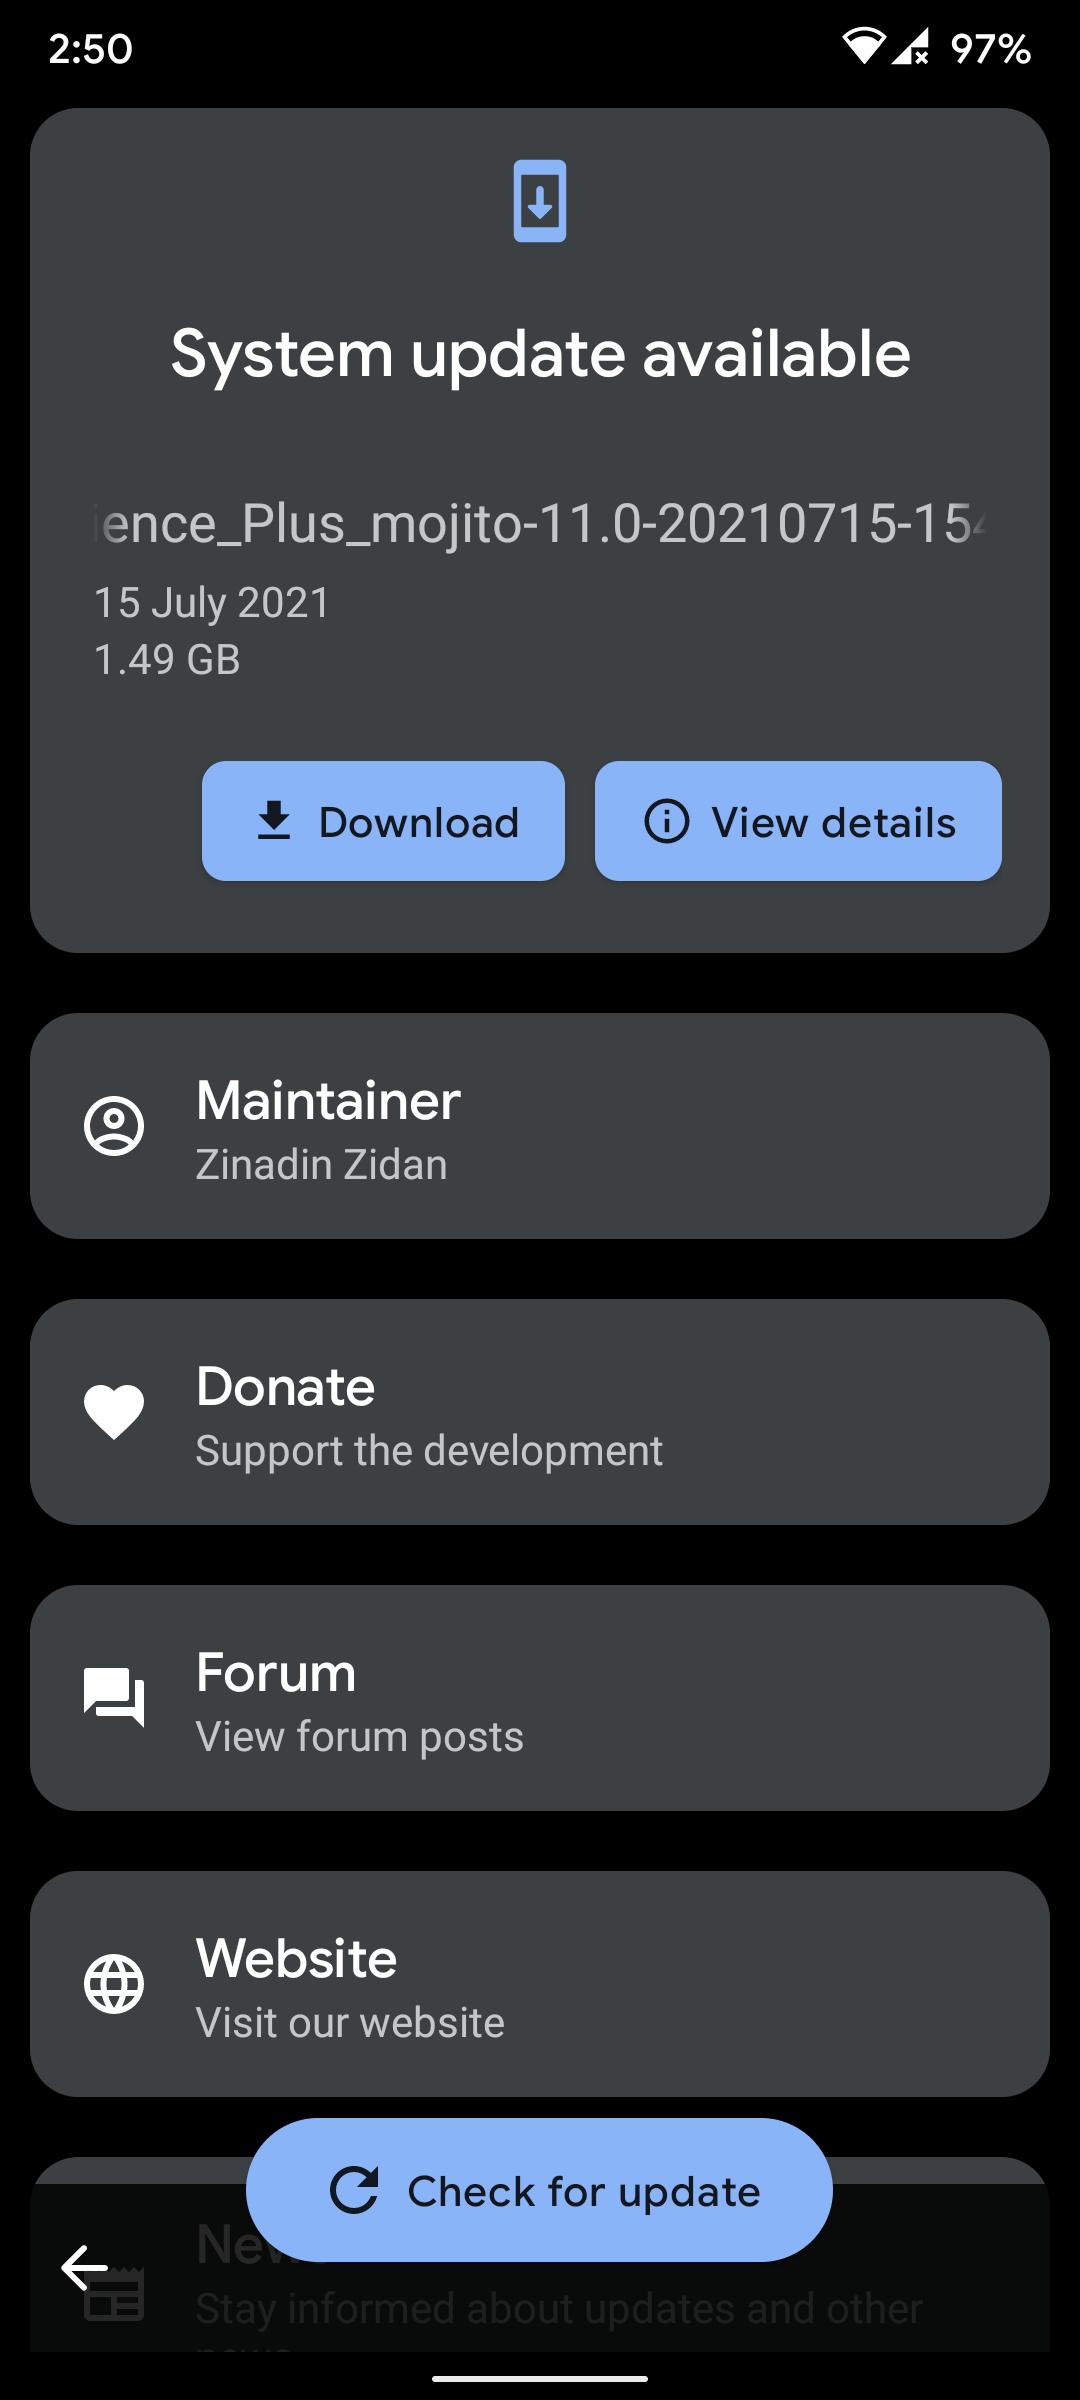 Screenshot_20210729-145051_System_update.png